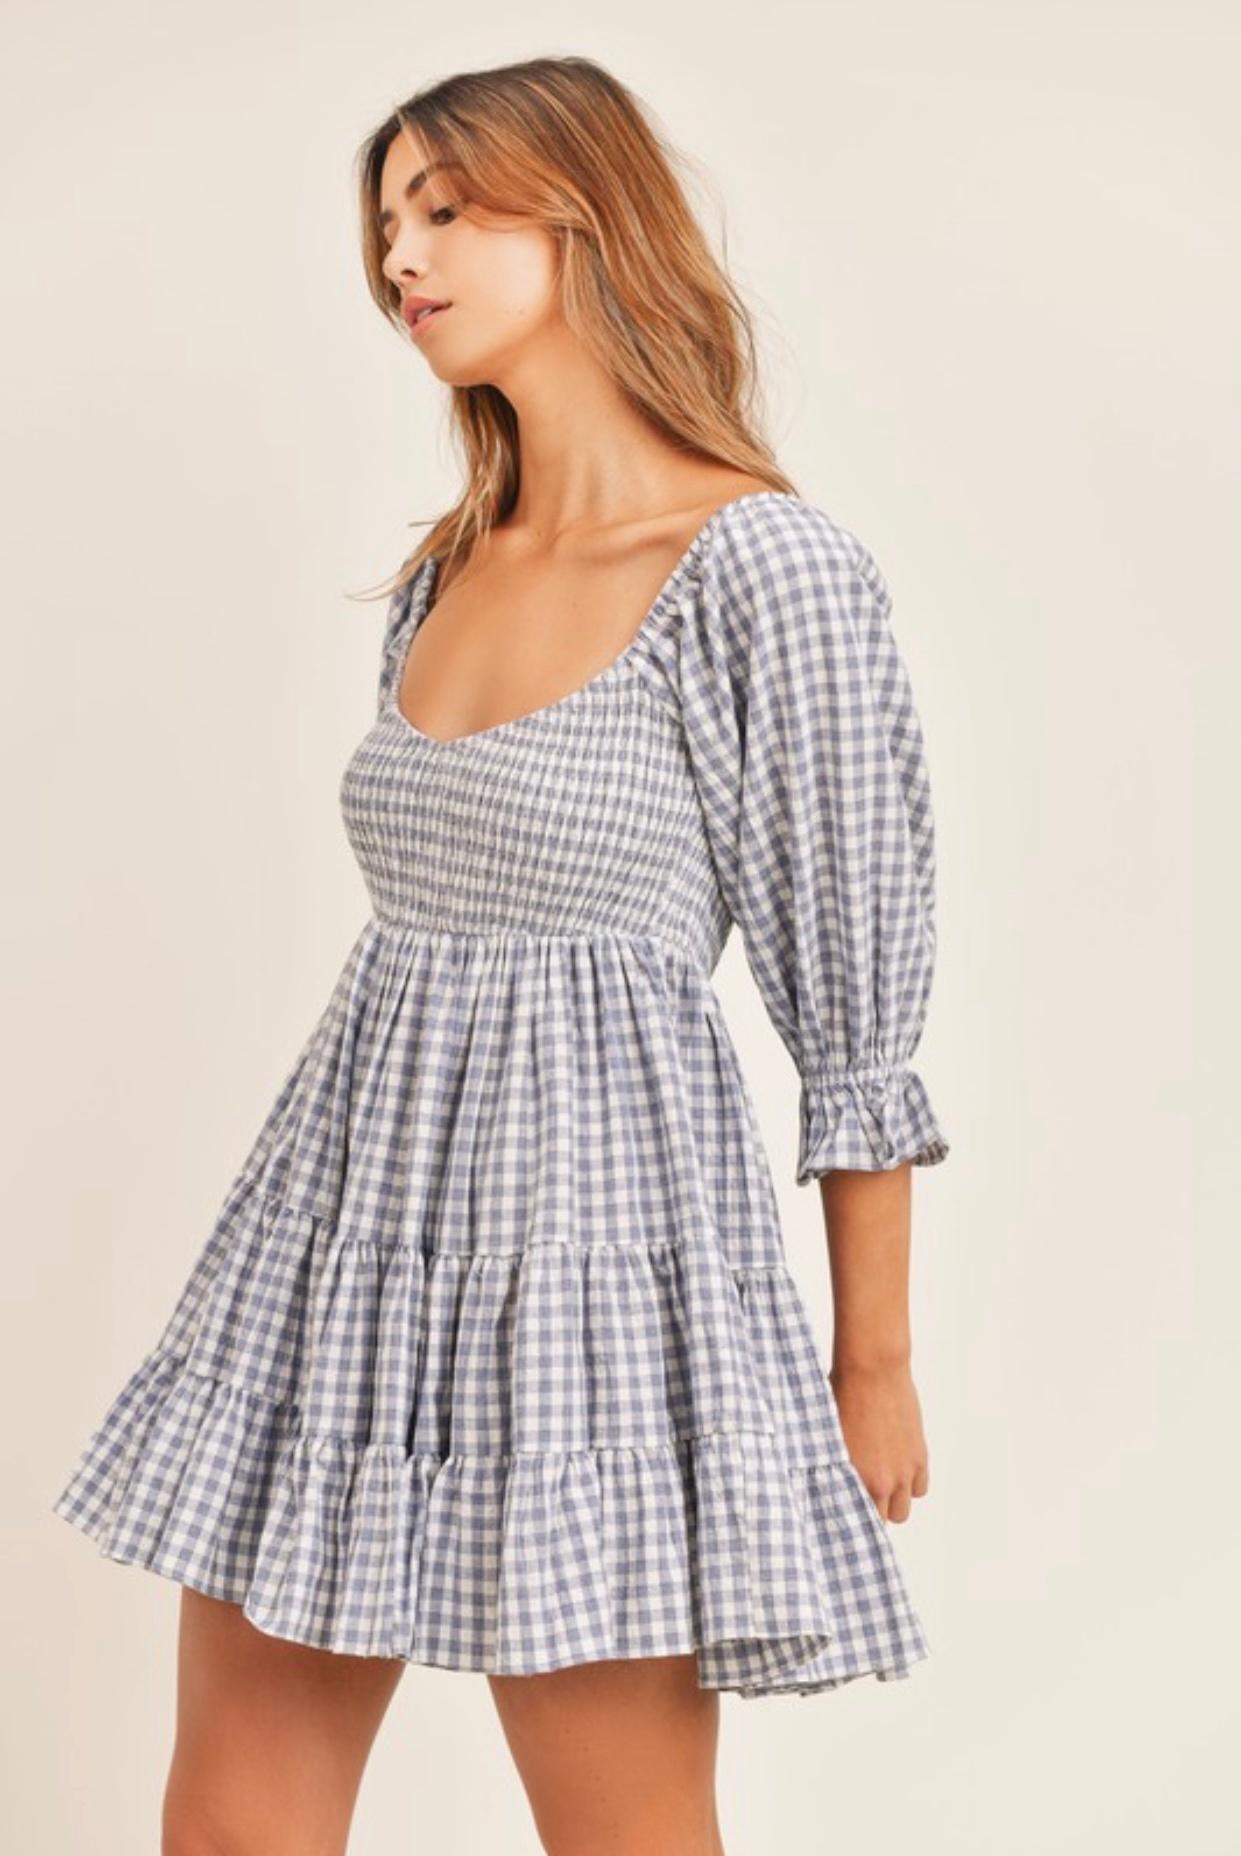 Layla Gingham Dress